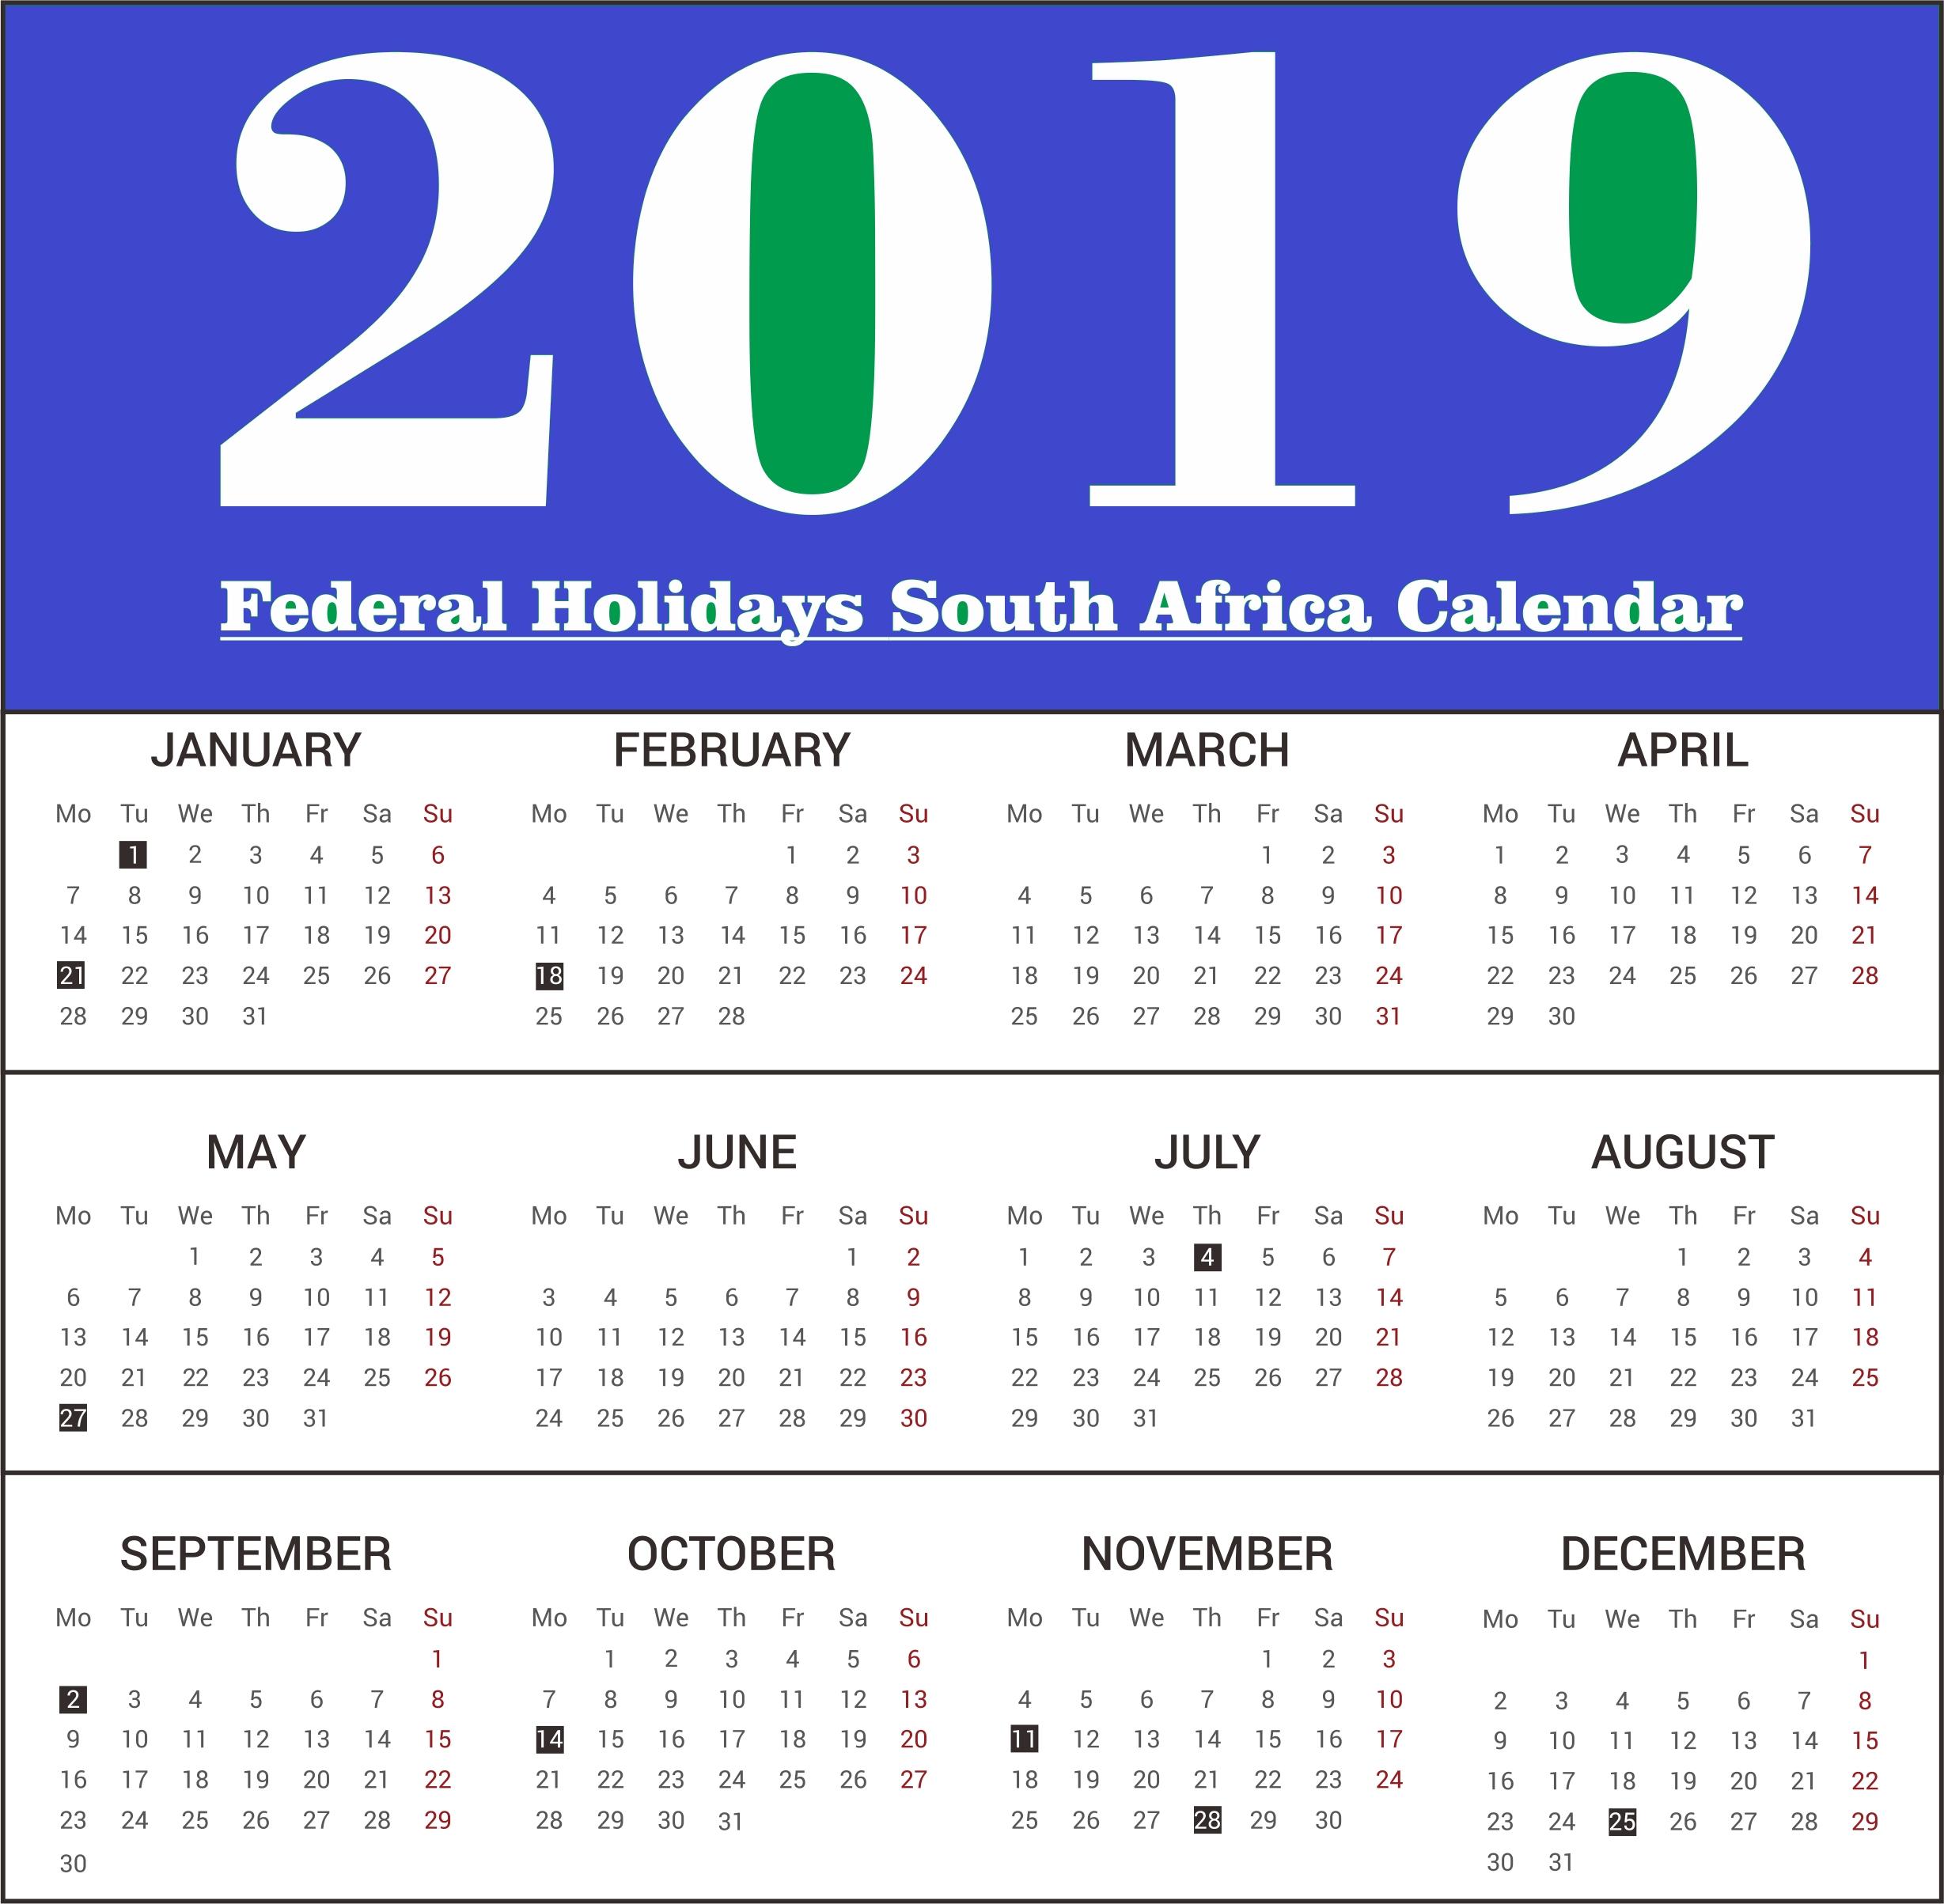 2019 South Africa Federal Holidays Calendar #southafrica Dashing Printable Desk Calender South Africa